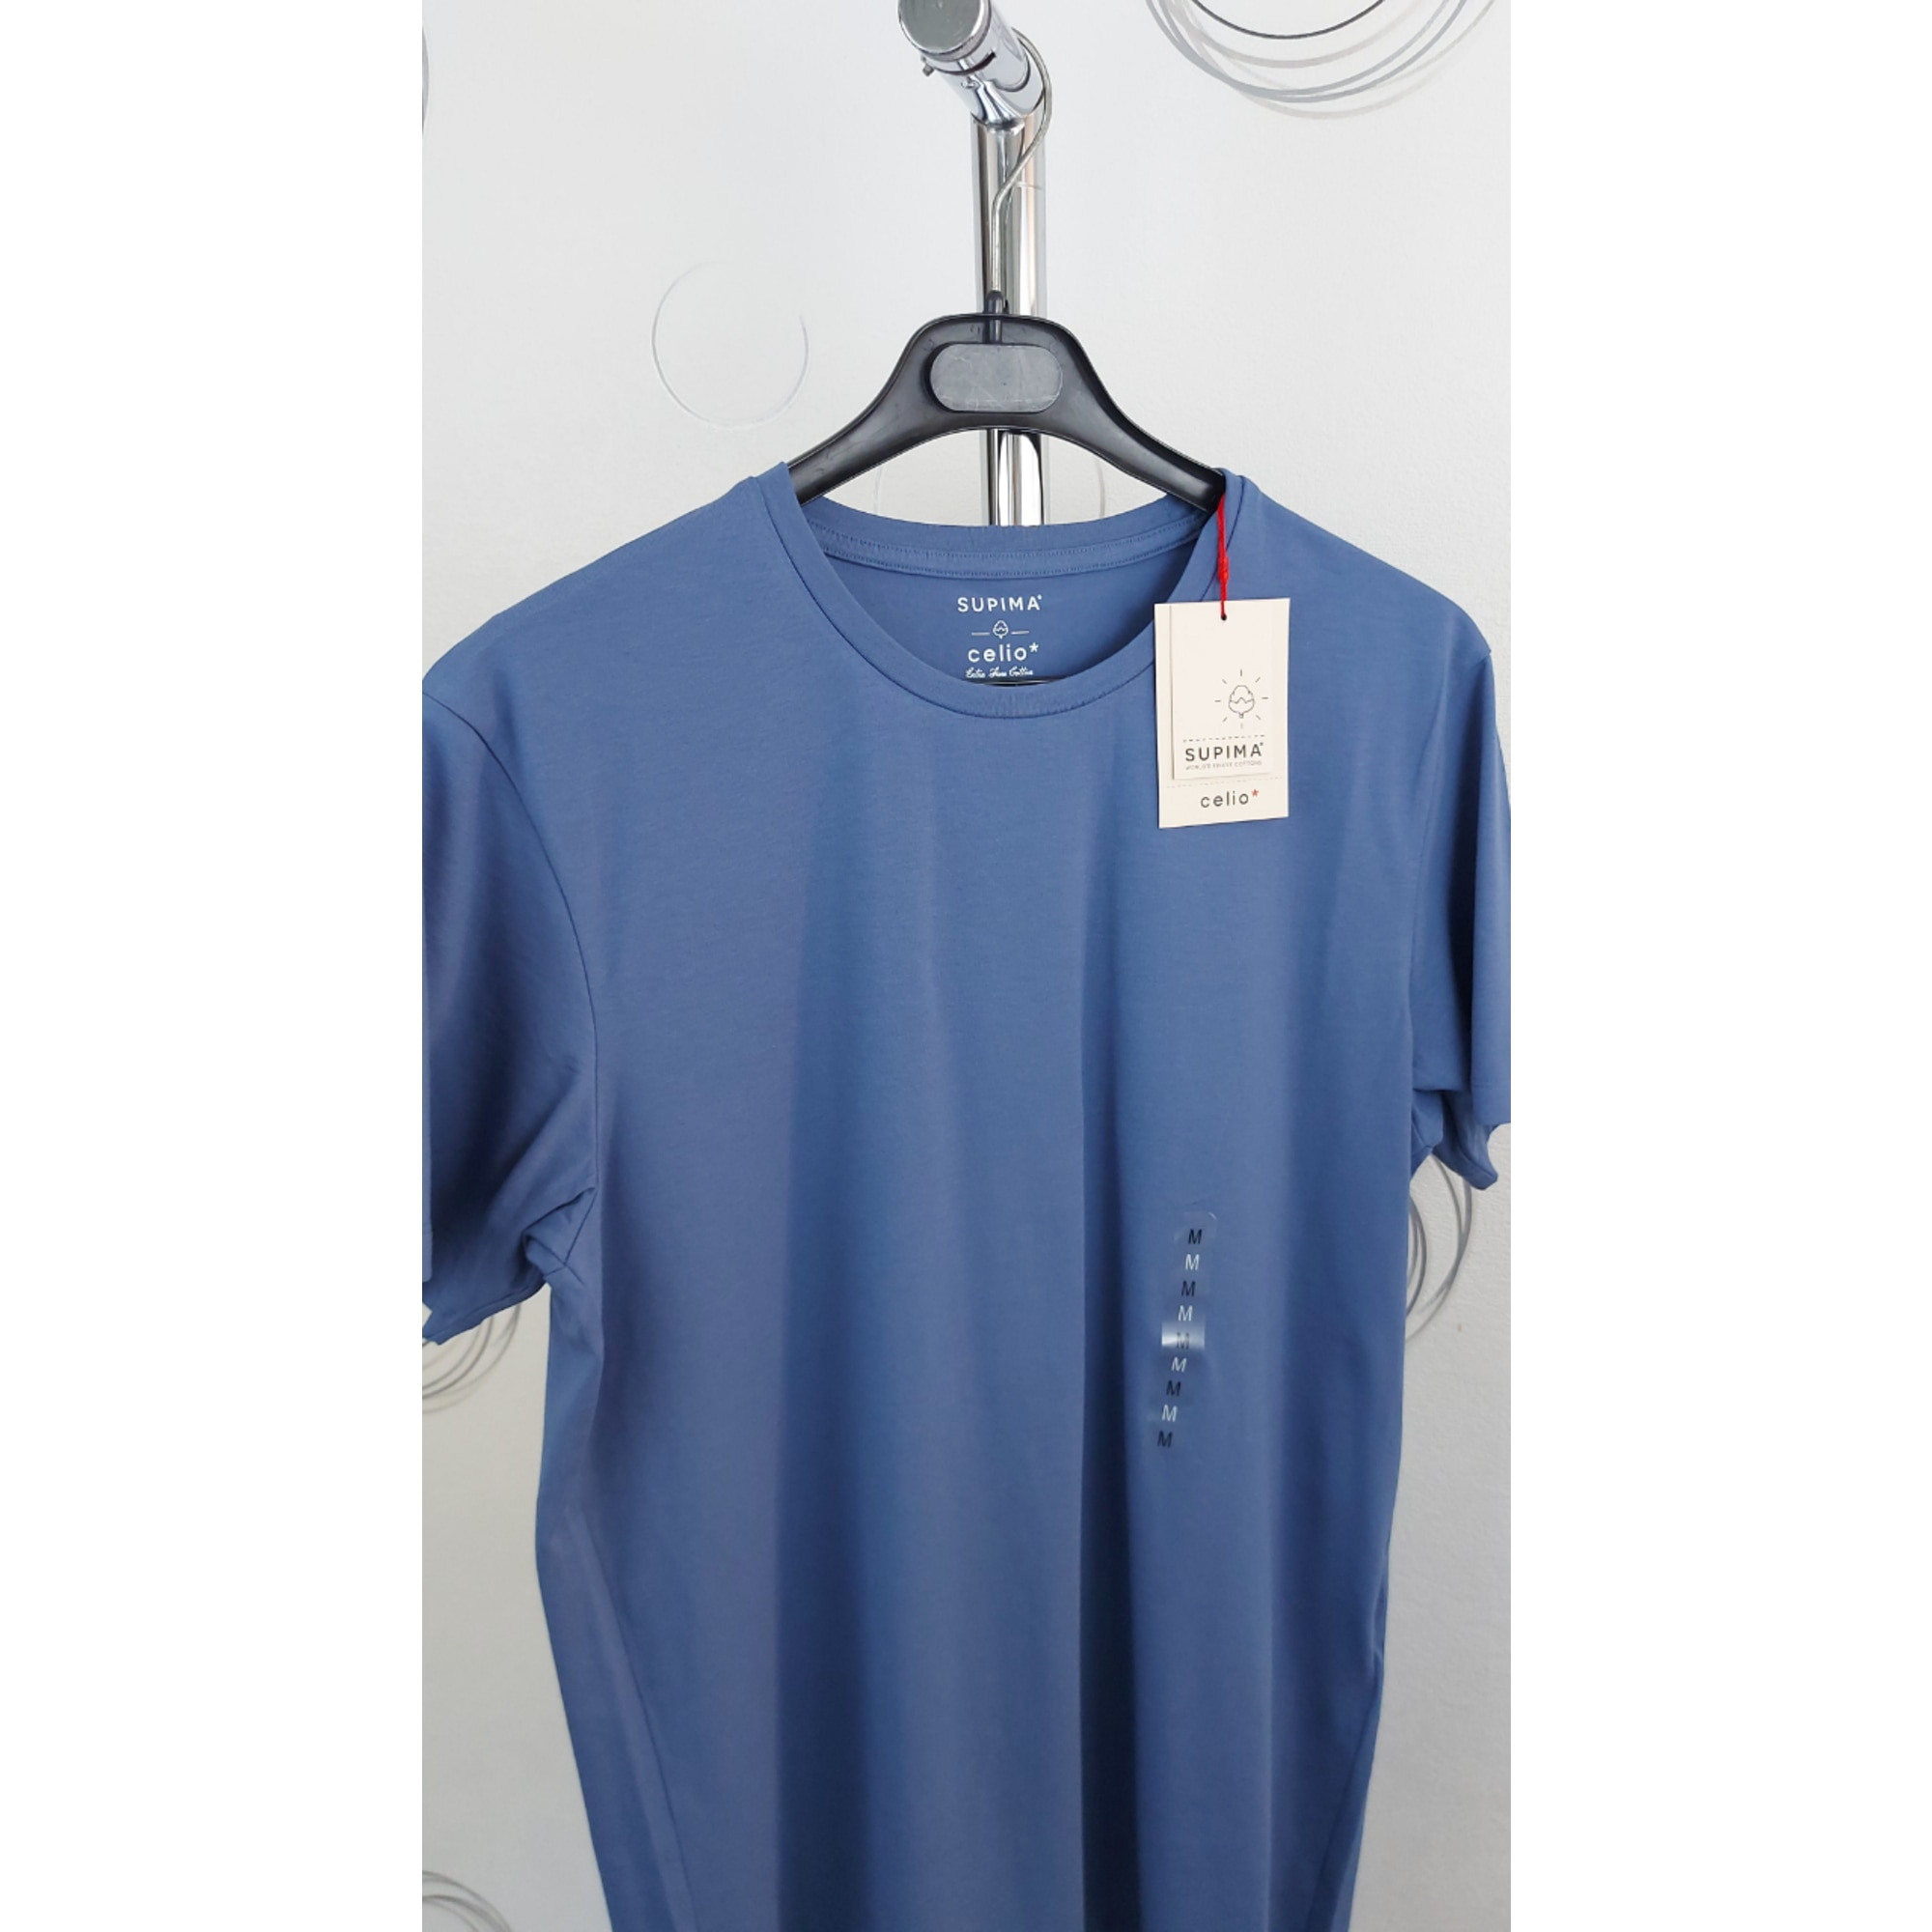 Tee-shirt CELIO Bleu, bleu marine, bleu turquoise